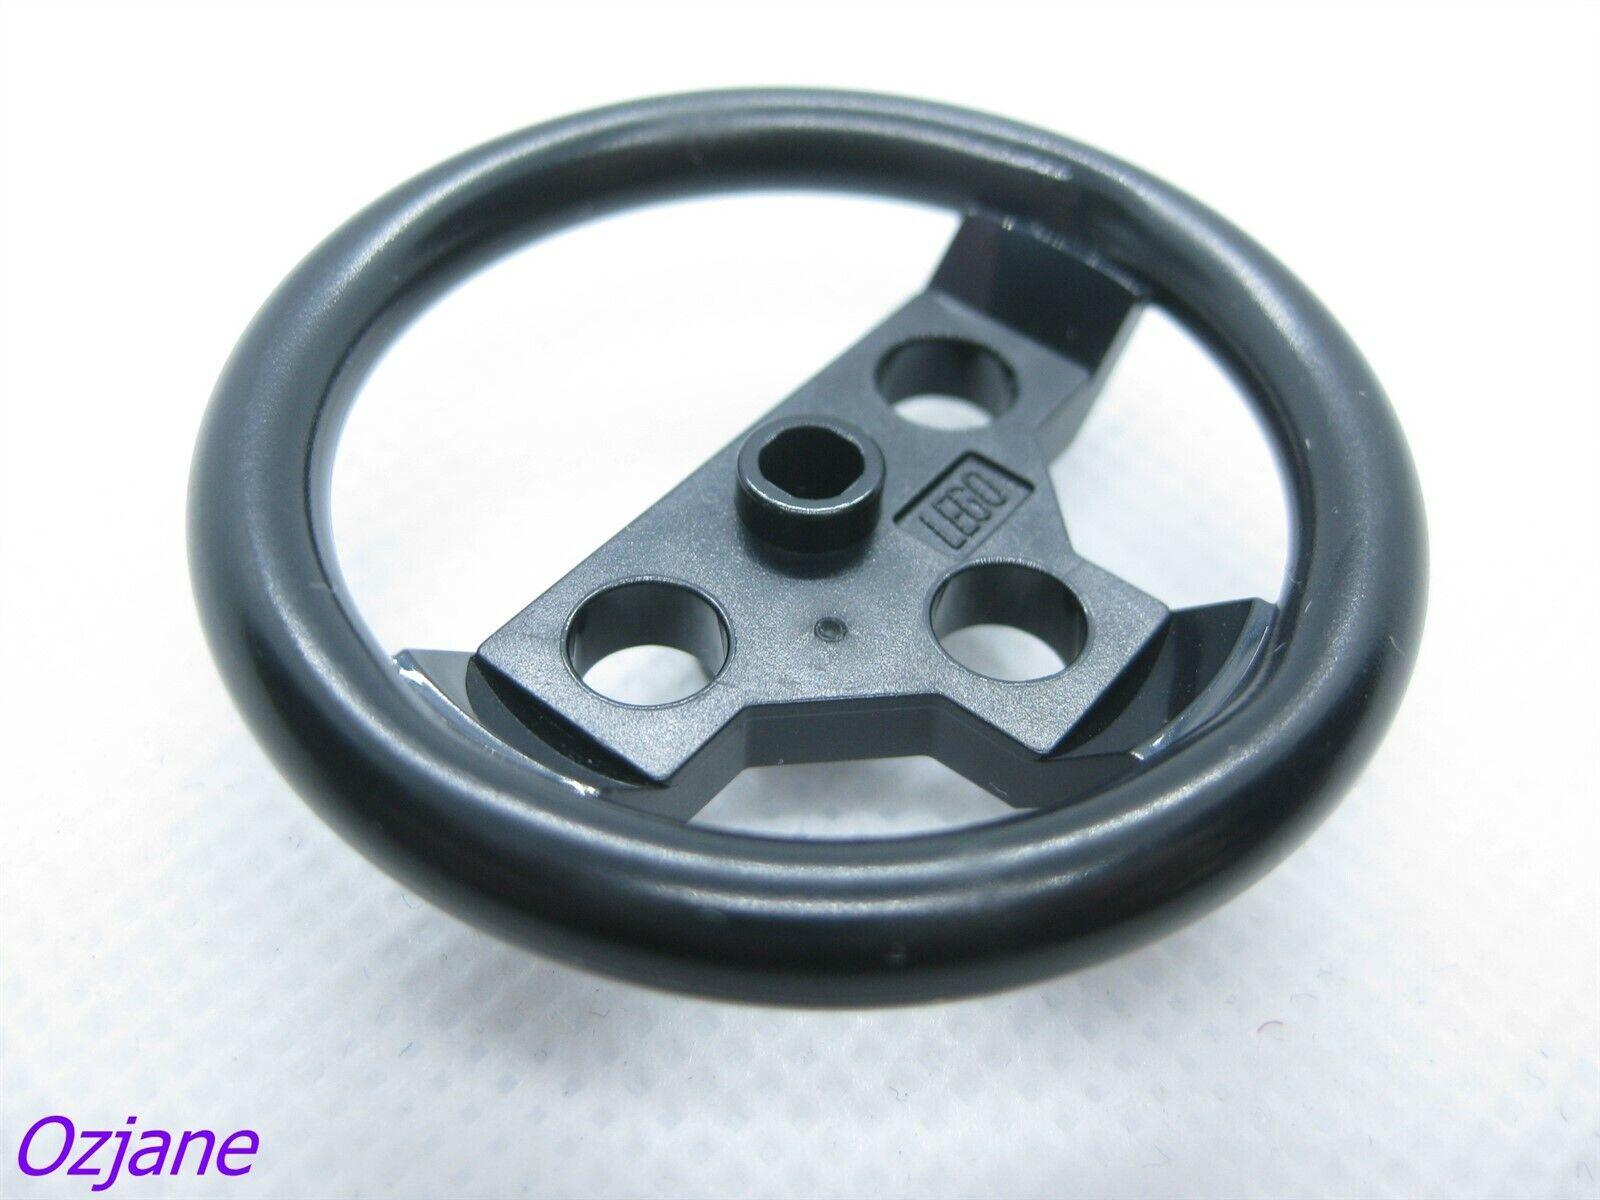 Technic Lego Large Steering Wheel in Black part no 2741